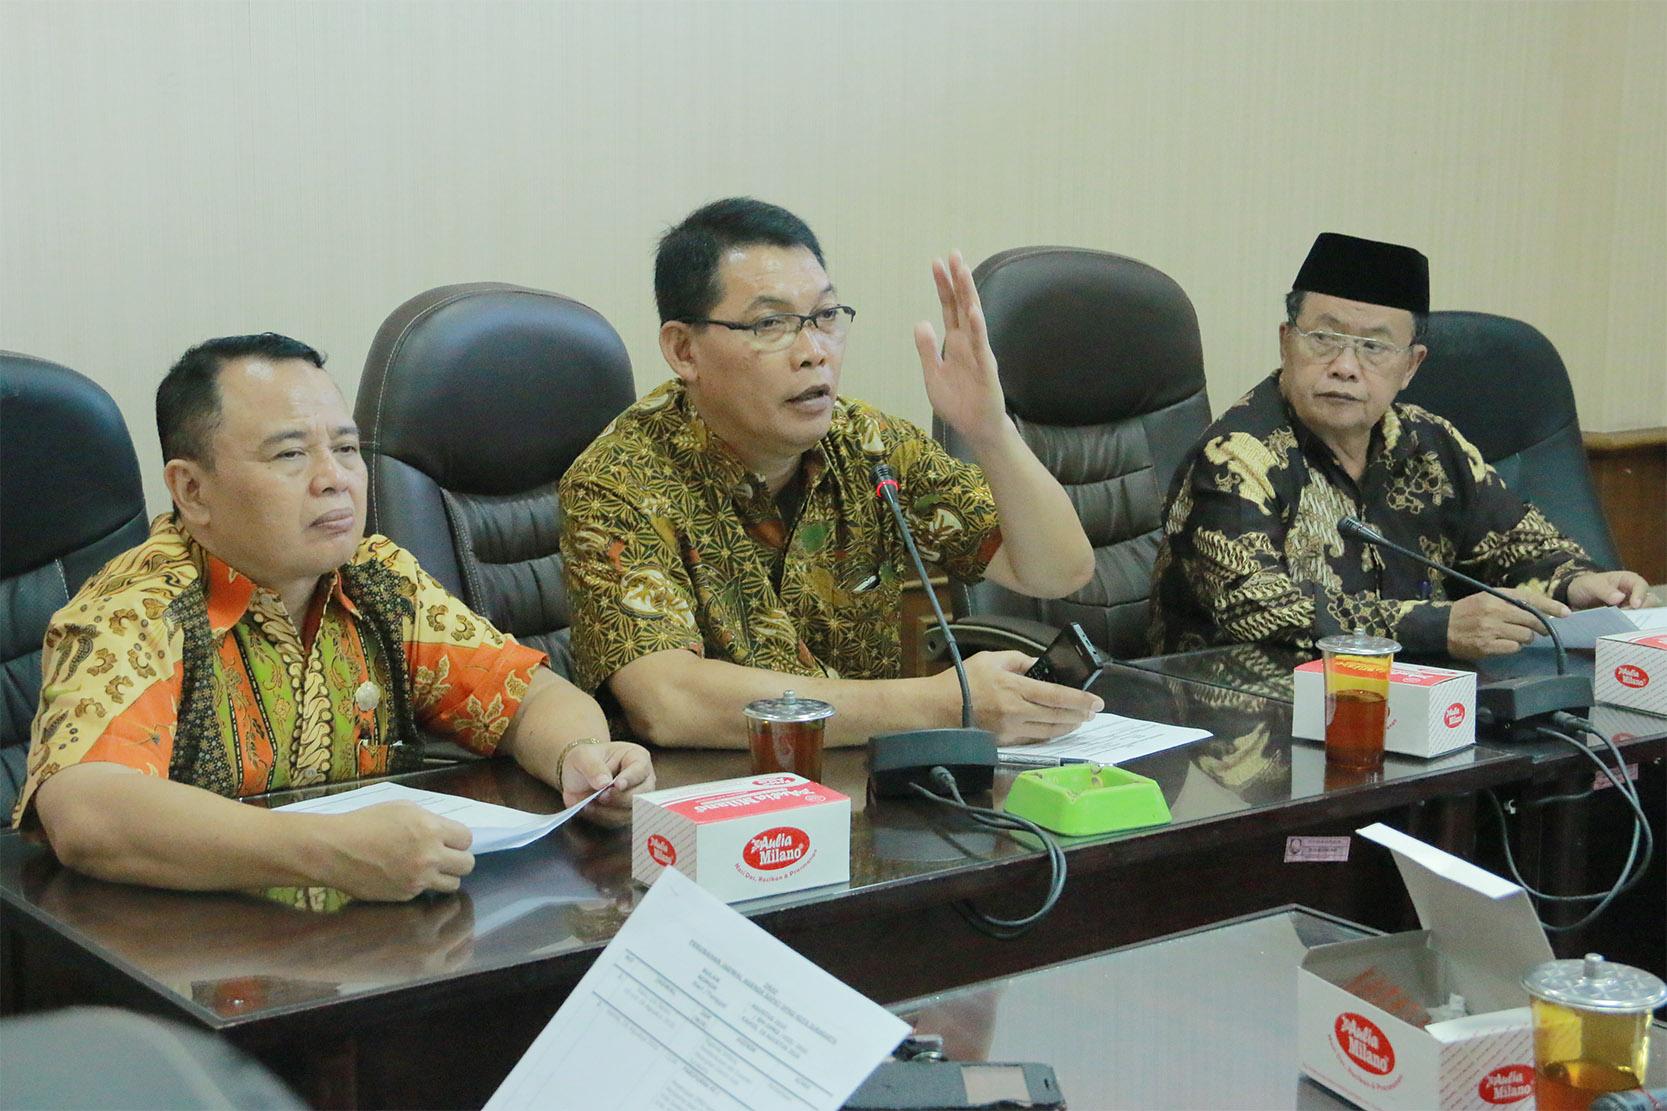 Rapat Banmus (Badan Musyawarah) DPRD Kota Surakarta